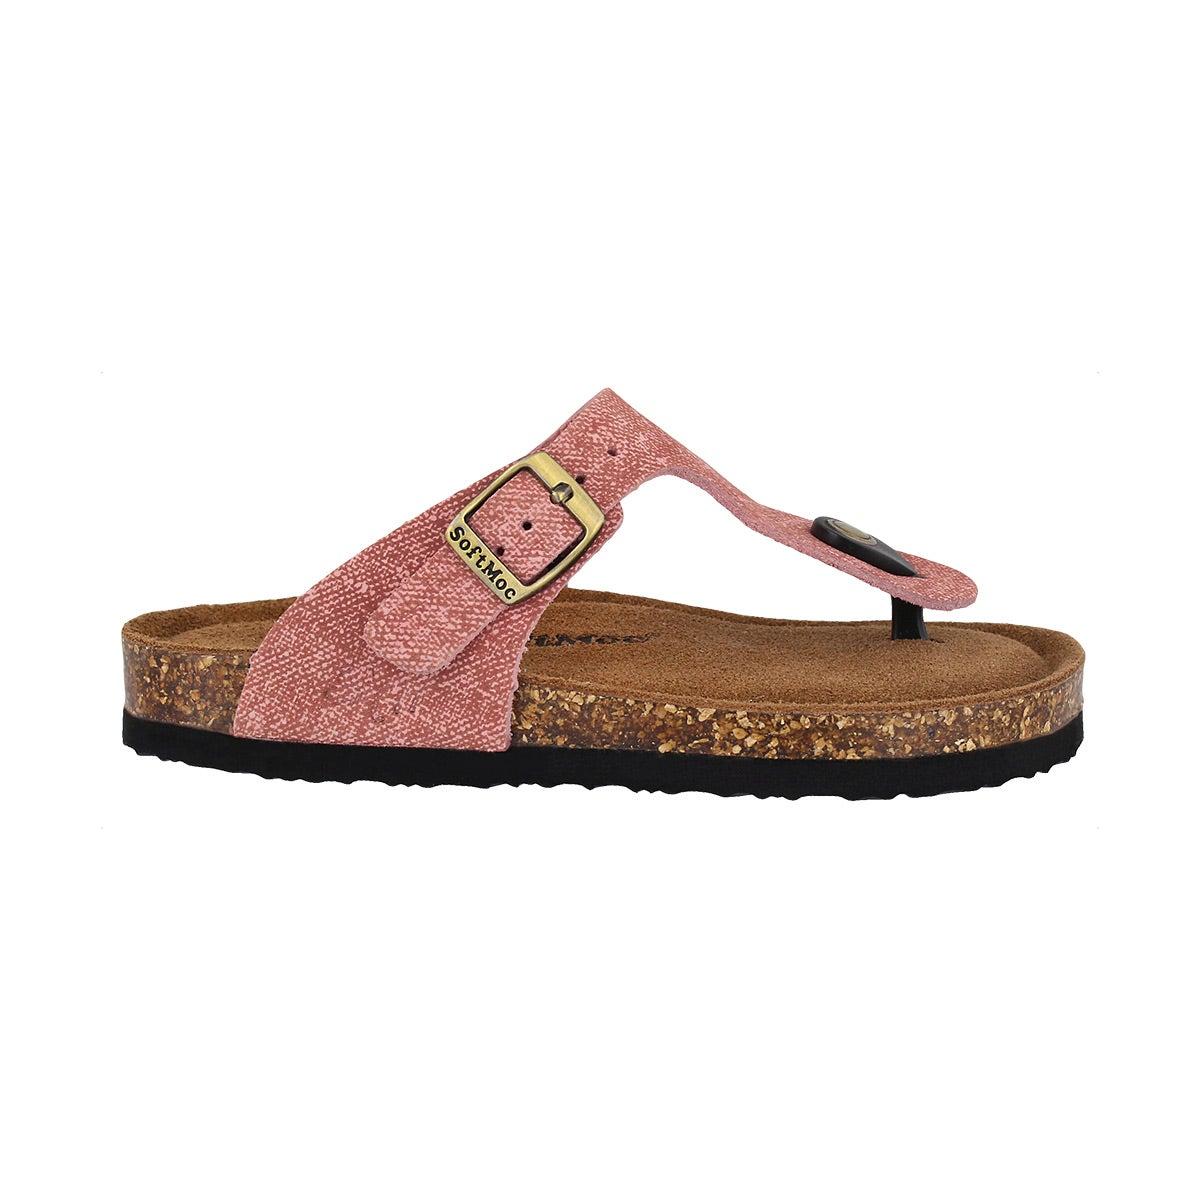 Grls Angy 5 blsh memory foam thng sandal